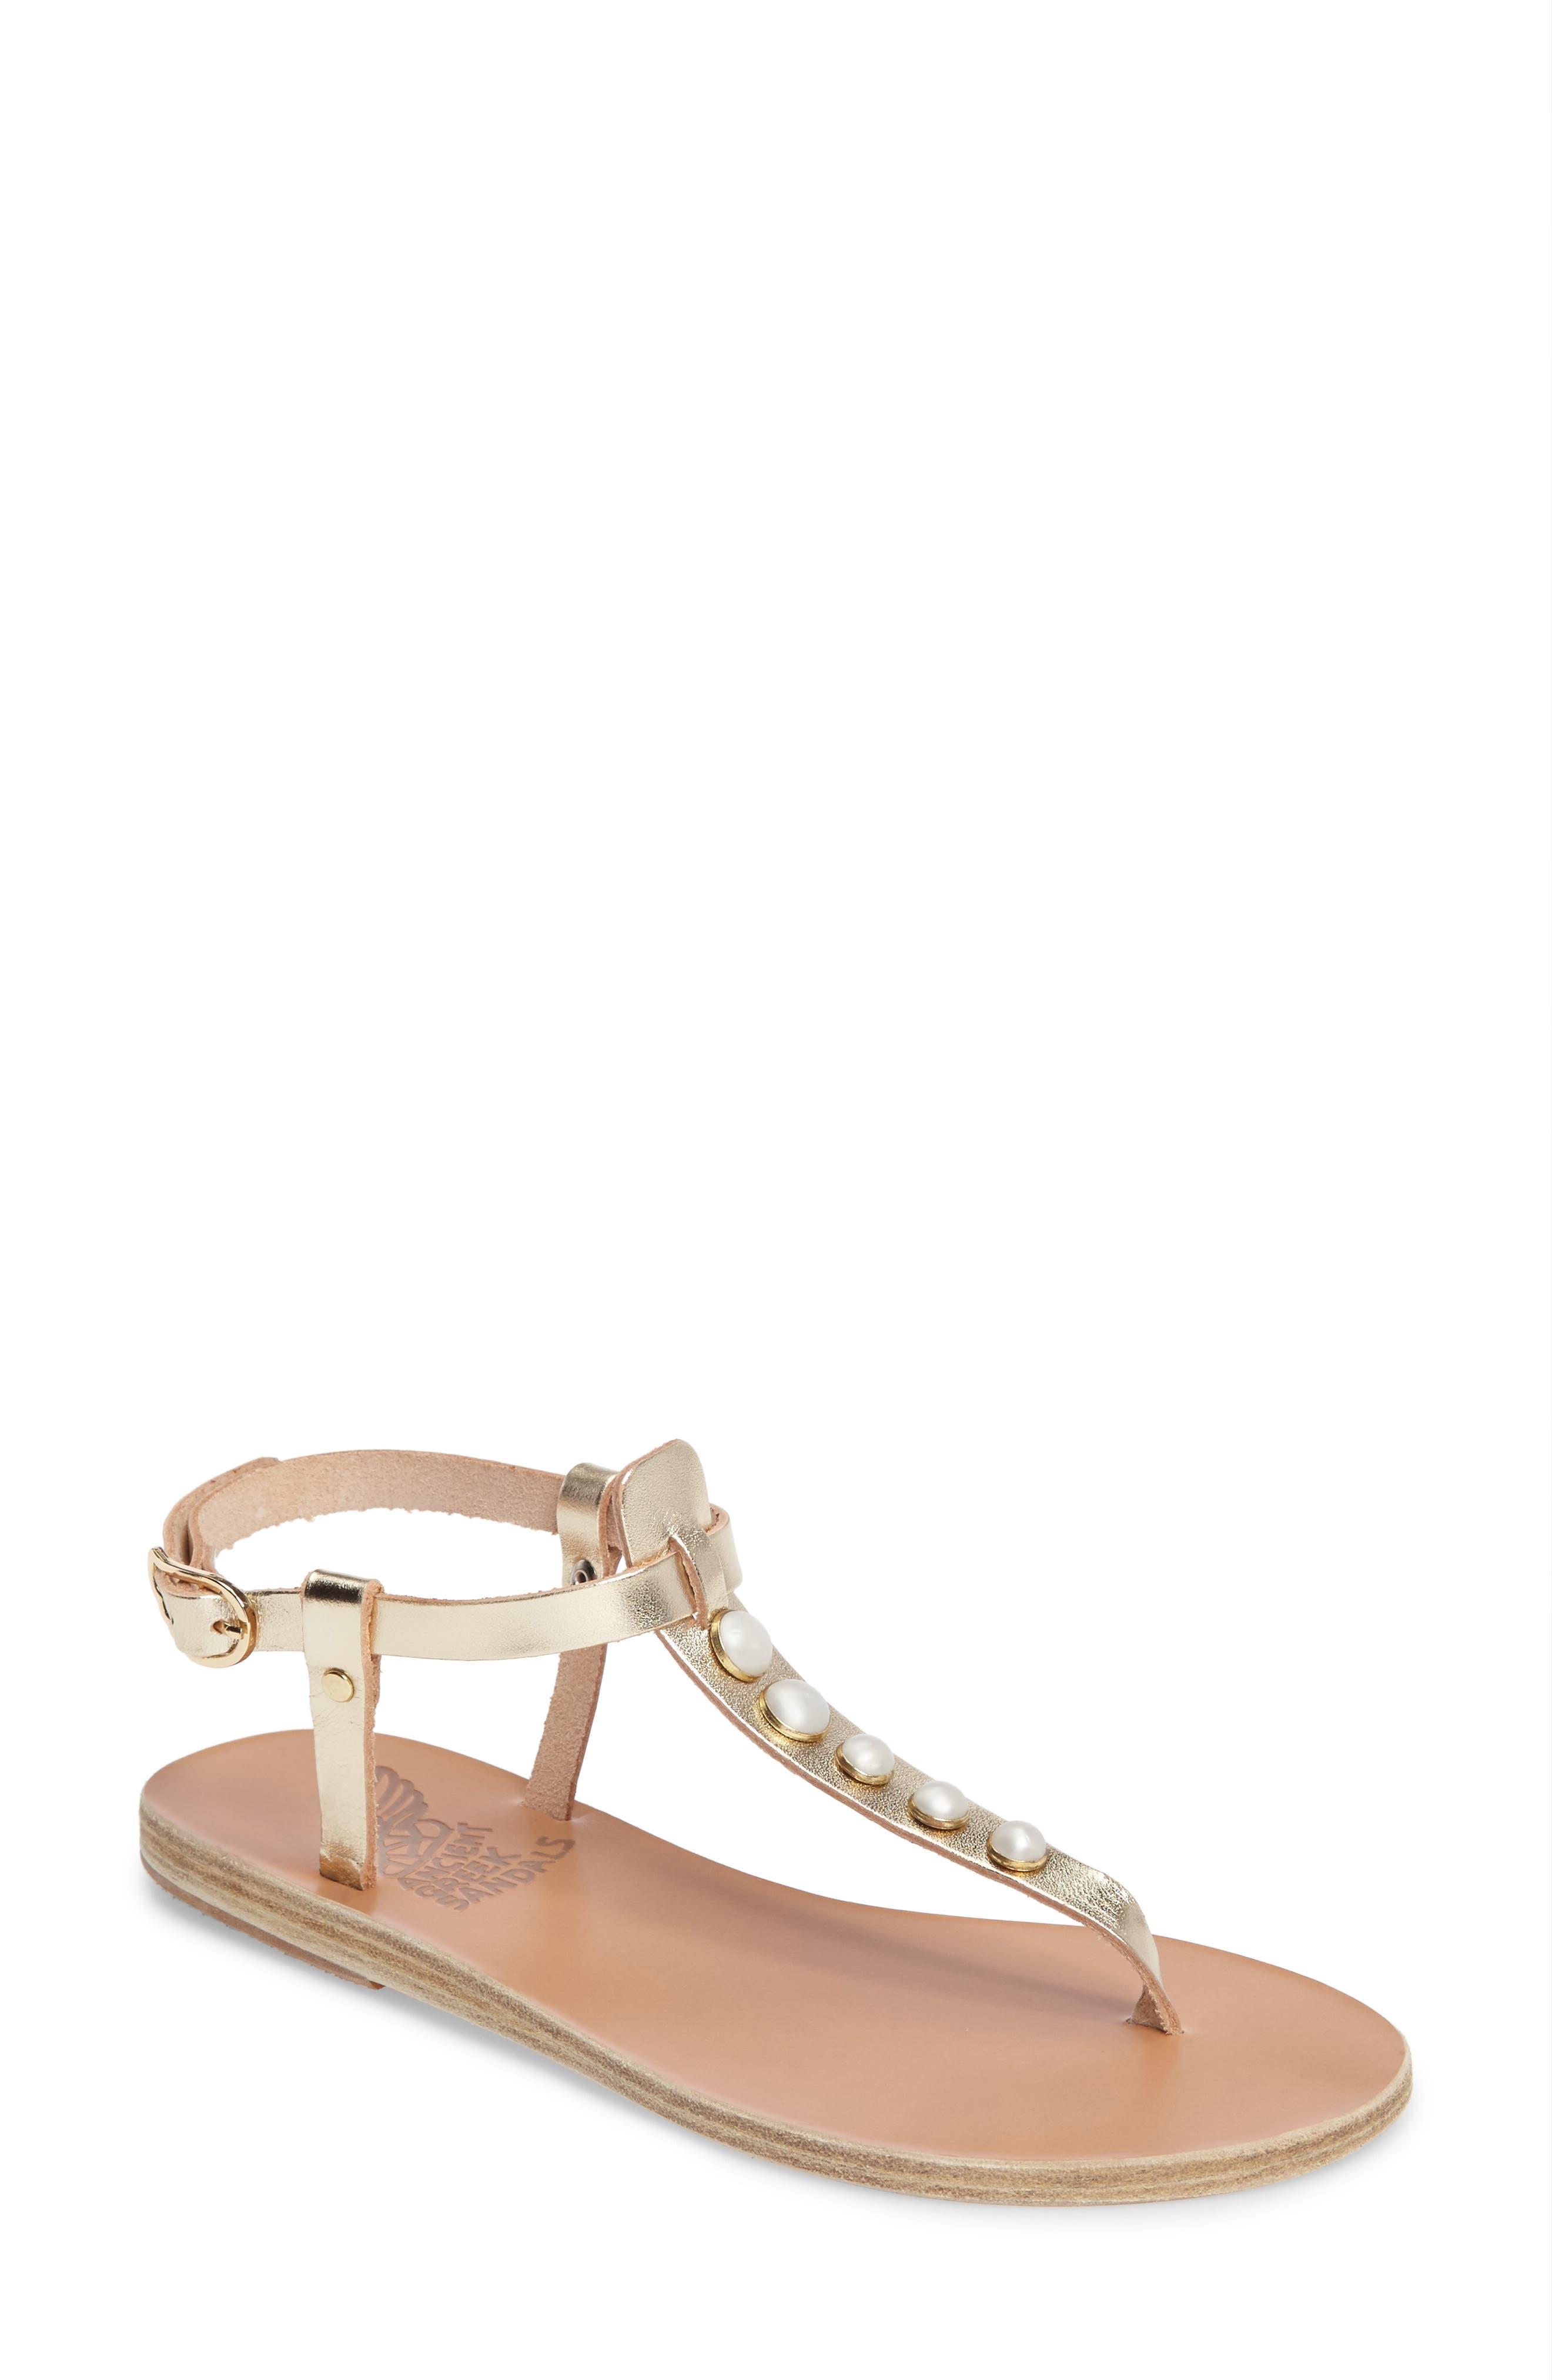 Lito Imitation Pearl Embellished T-Strap Sandal,                         Main,                         color, 040